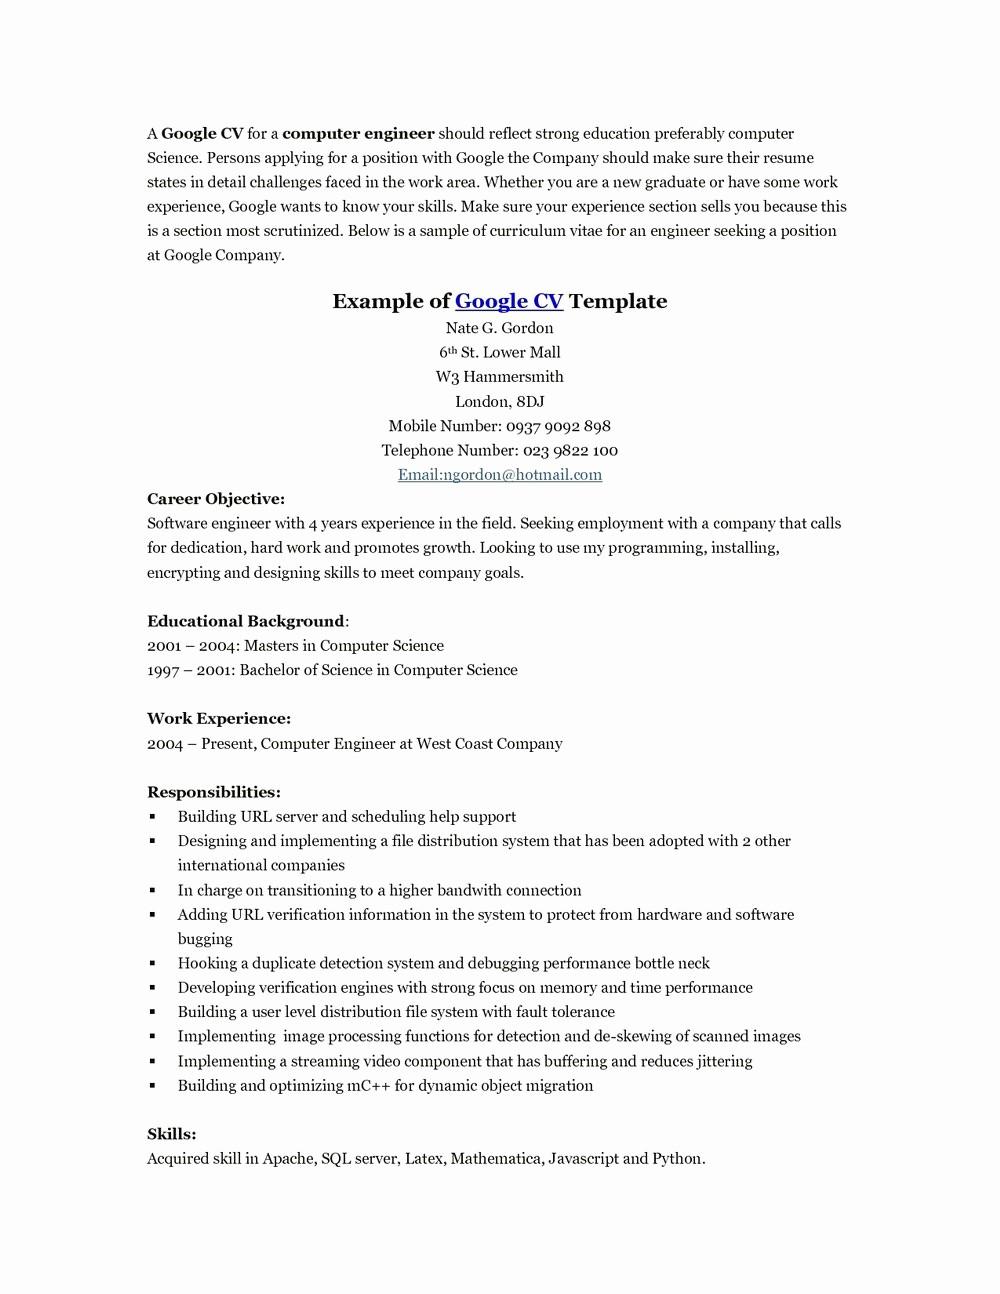 Resume Cover Letter Template Free Fresh Resume Cover Letter Template Free Download Cover Letters